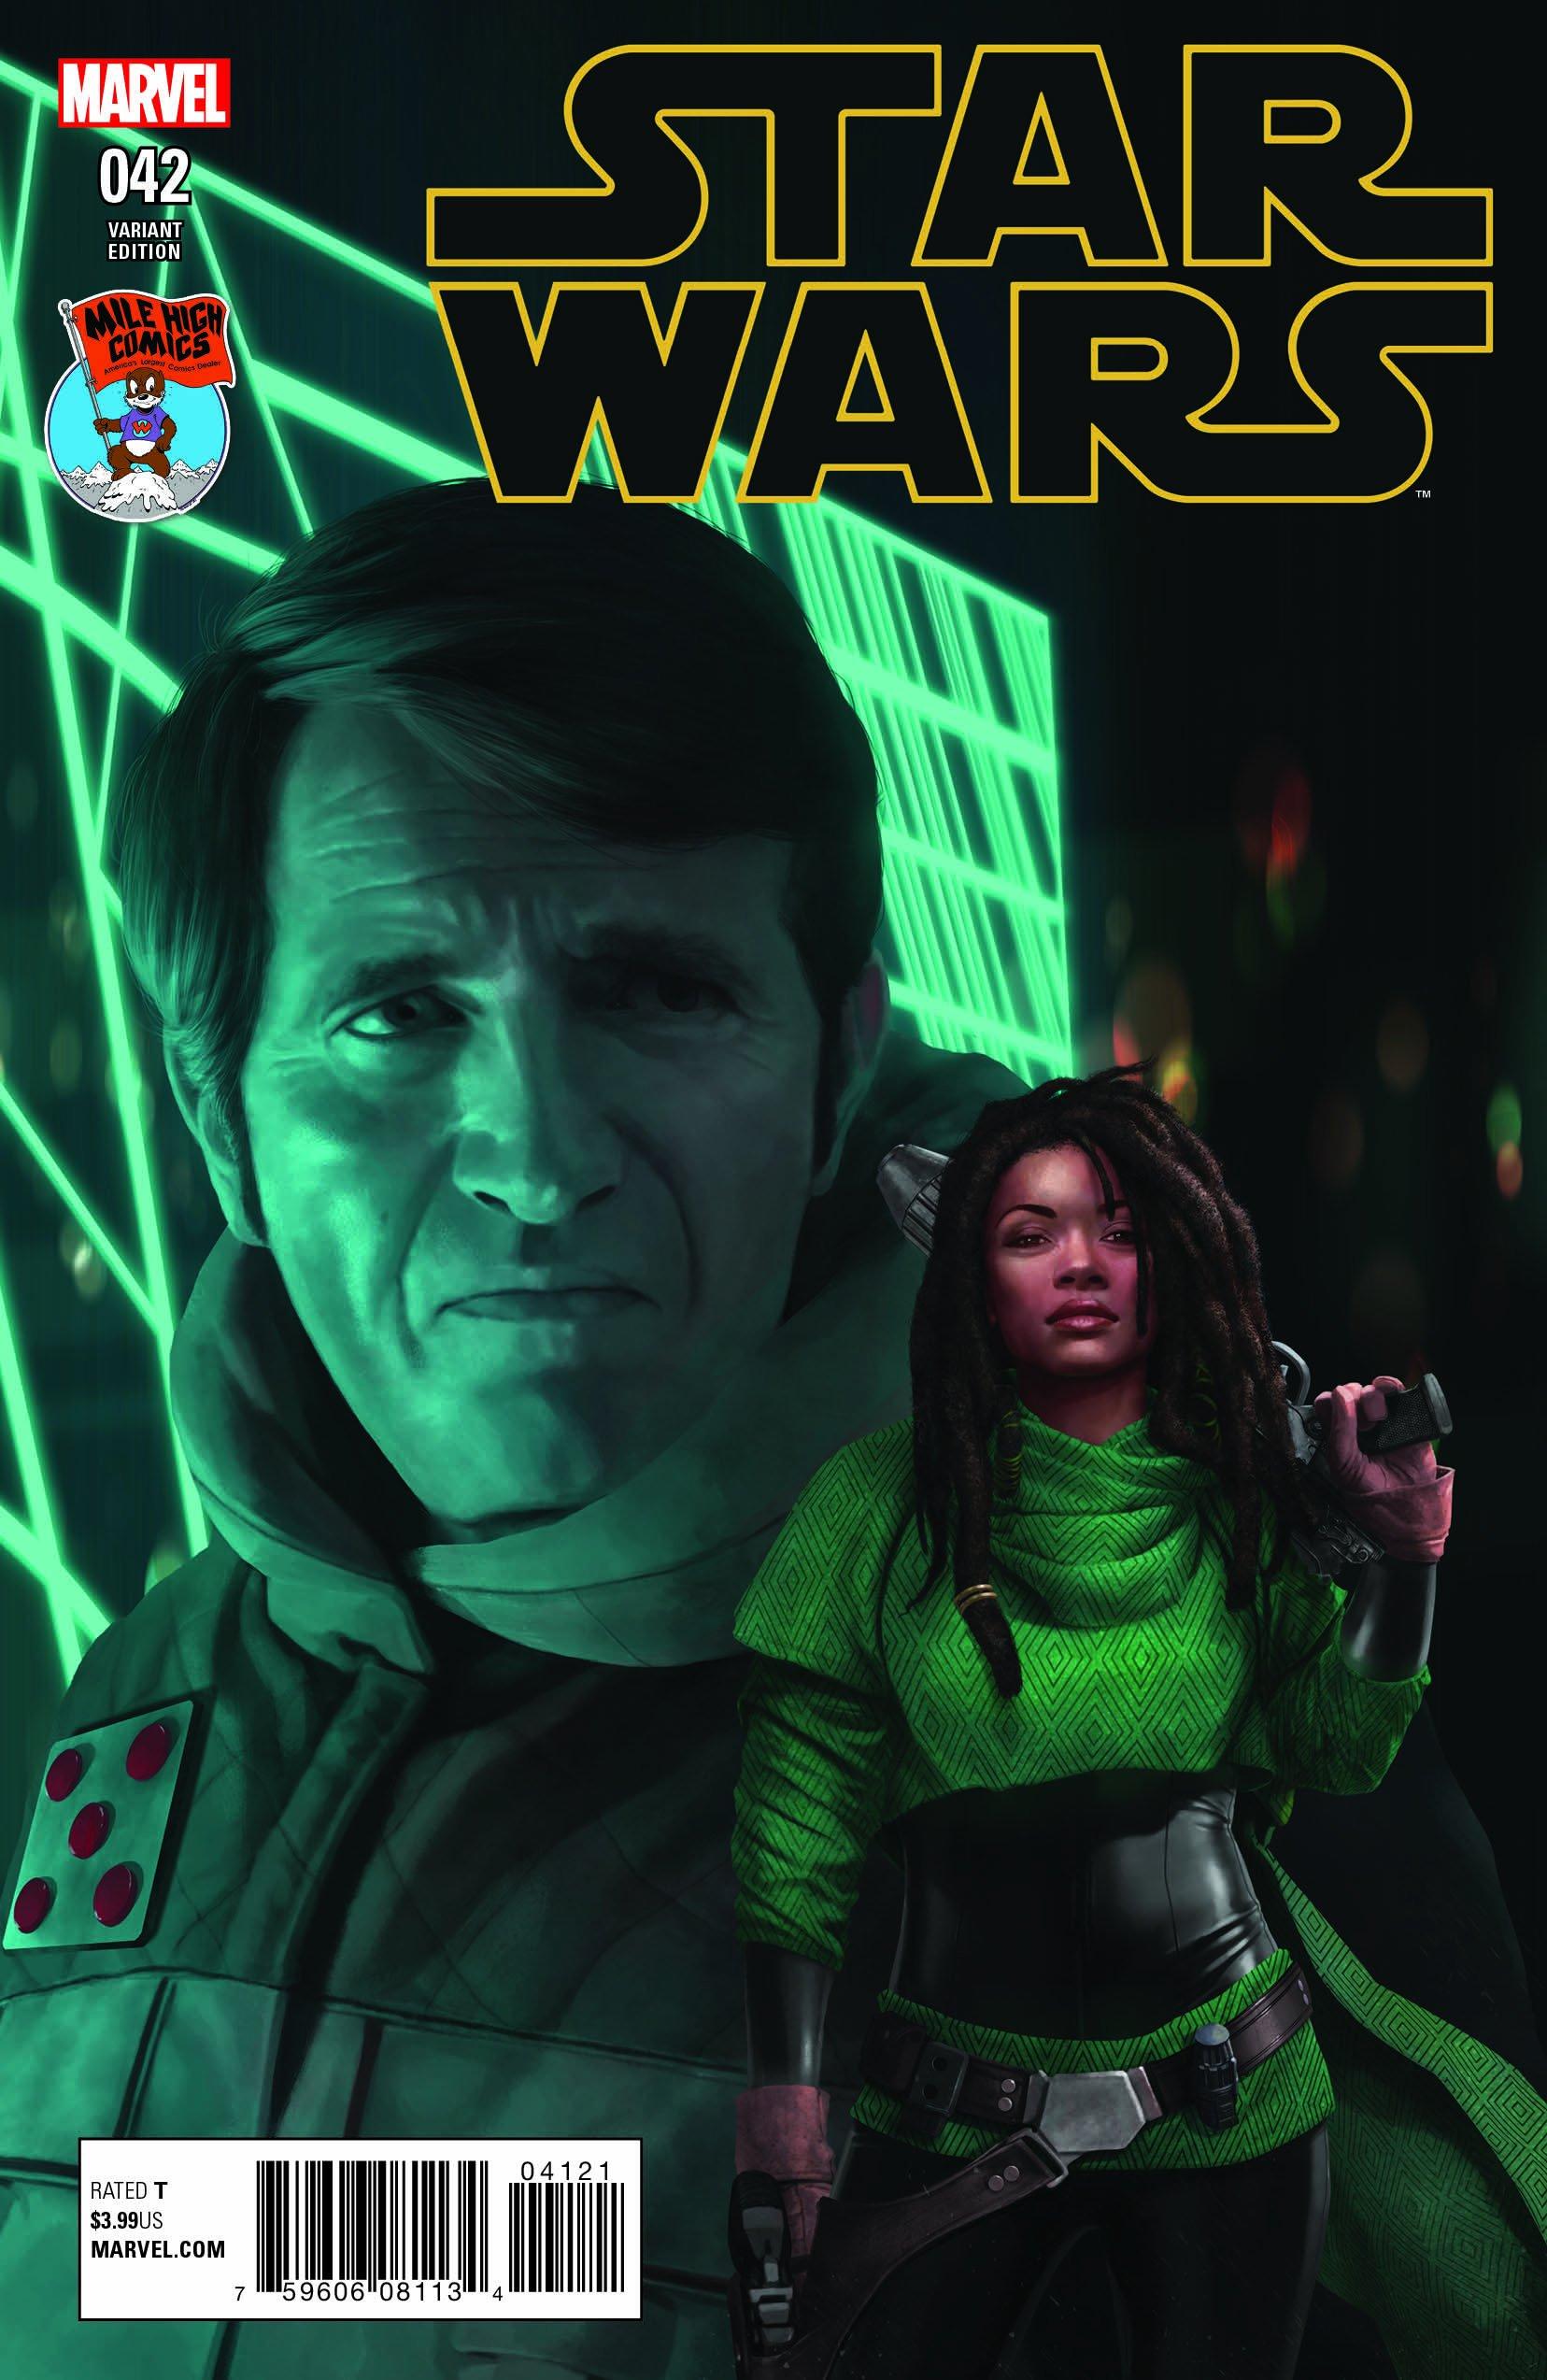 Star Wars #42 (Rahzzah Mile High Comics Variant Cover) (17.01.2018)